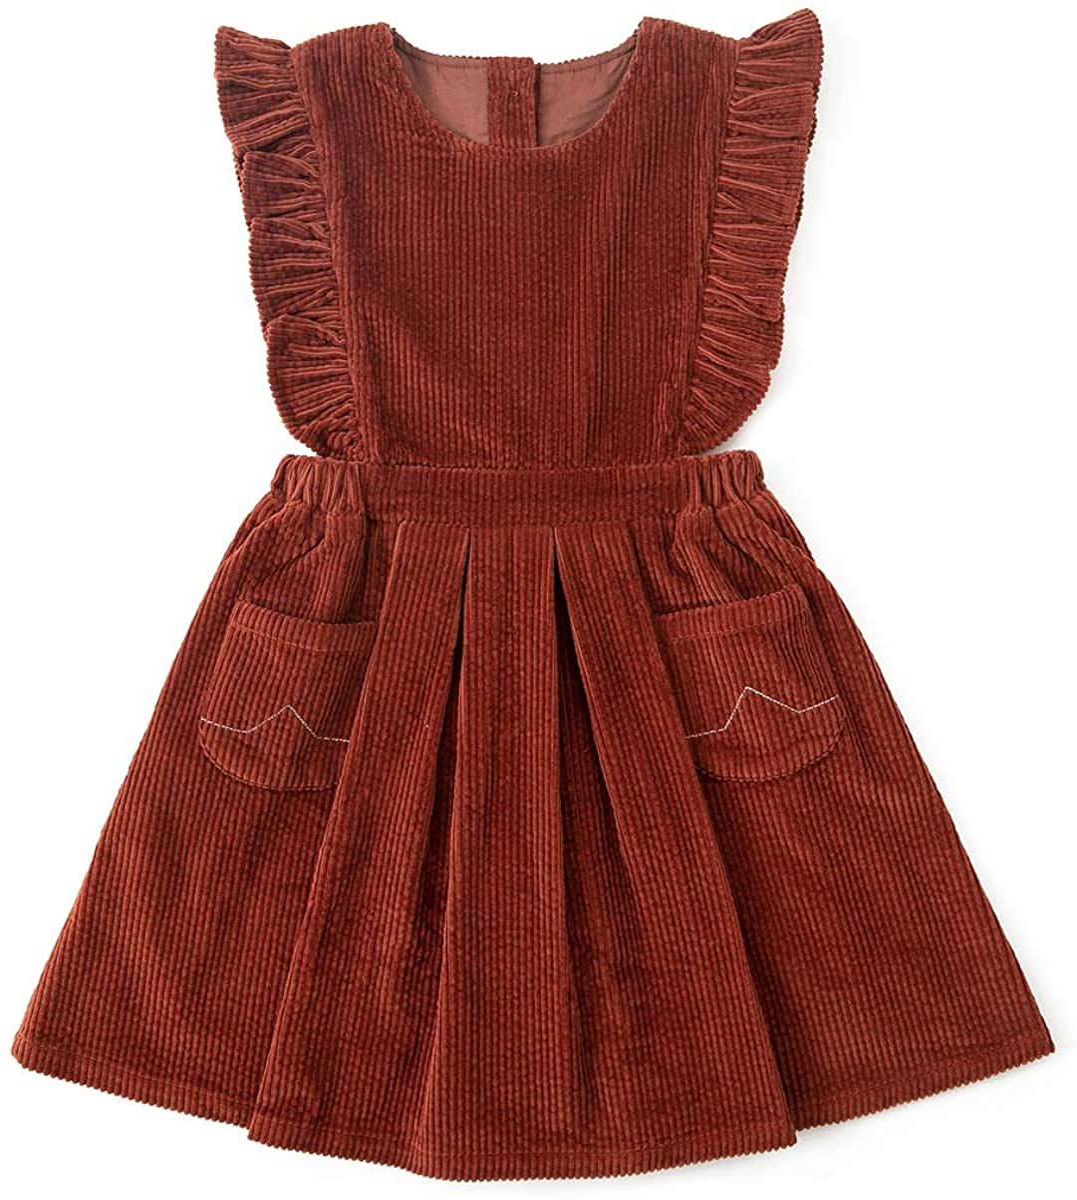 1930s Children's Fashion: Girls, Boys, Toddler, Baby Costumes Simplee kids Toddler Girl Casual Dress for Spring Girls Skrit with Pocket  AT vintagedancer.com